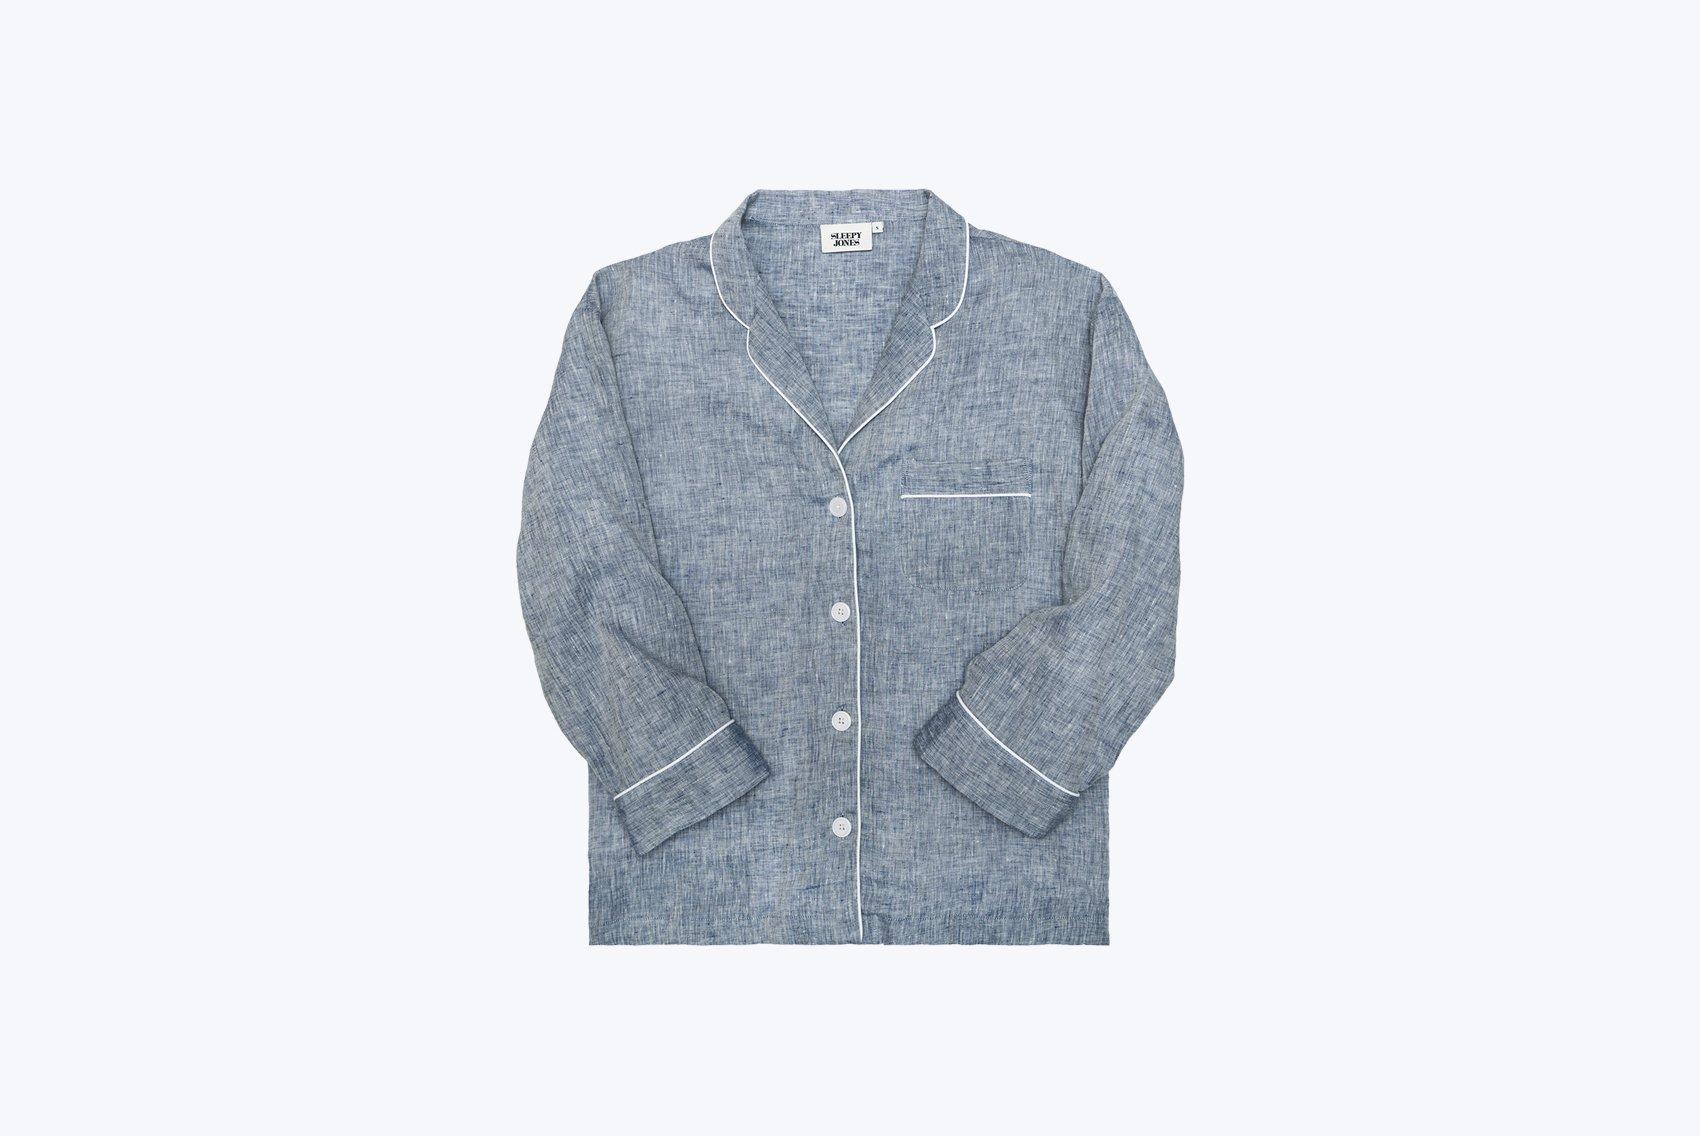 Linen Wedding Anniversary Gifts, Sleepy Jones Pajama Shirt